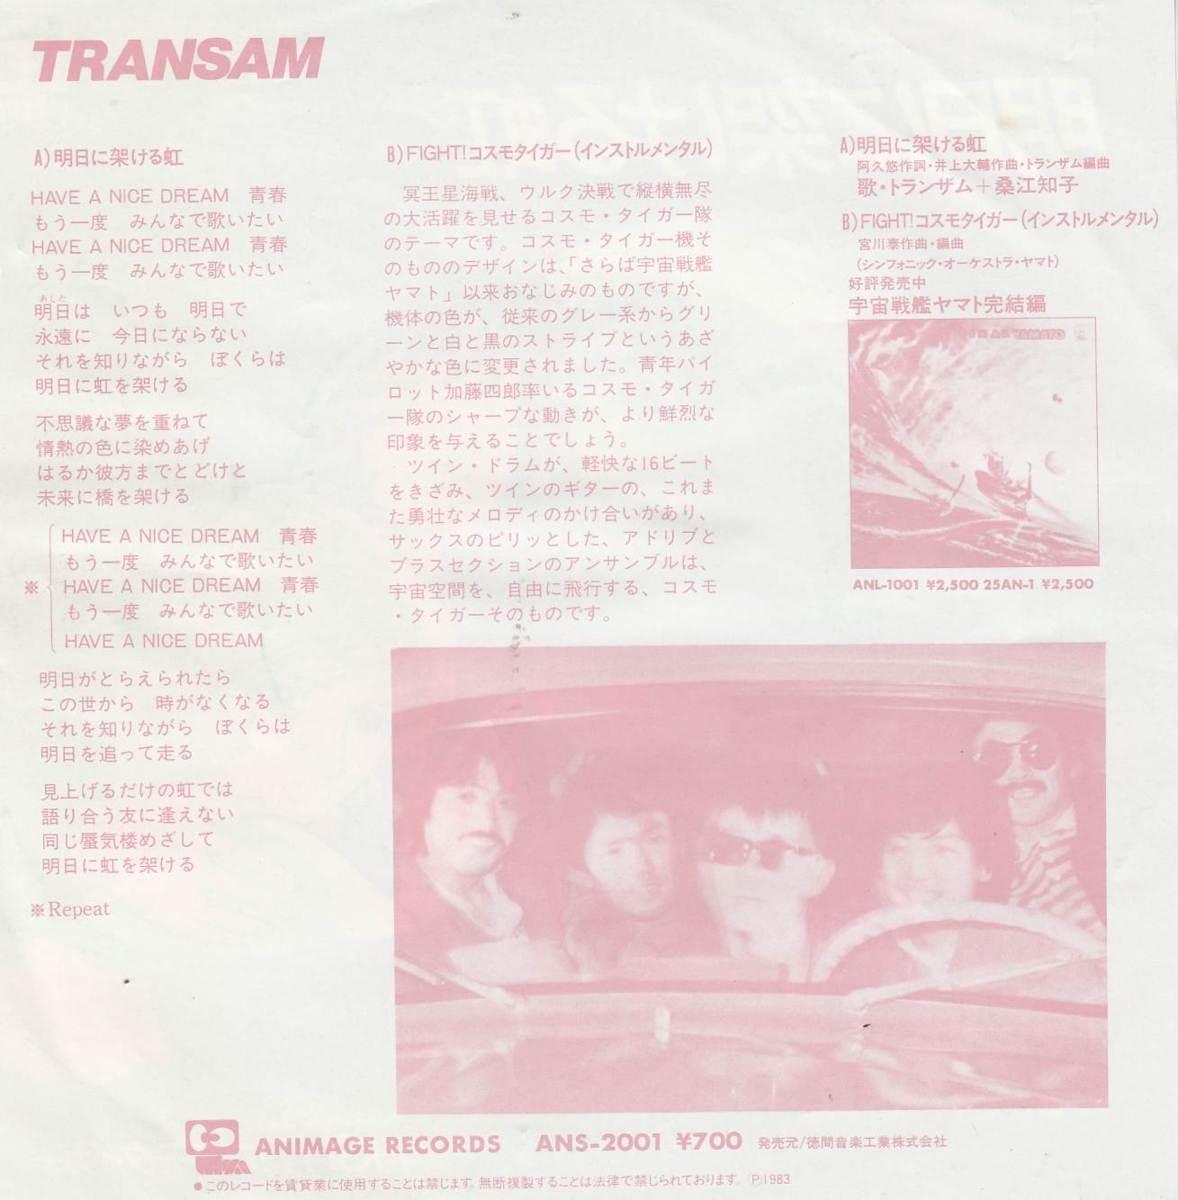 E09250-【EP】トランザム 桑江知子 宇宙戦艦ヤマト 挿入歌_画像2